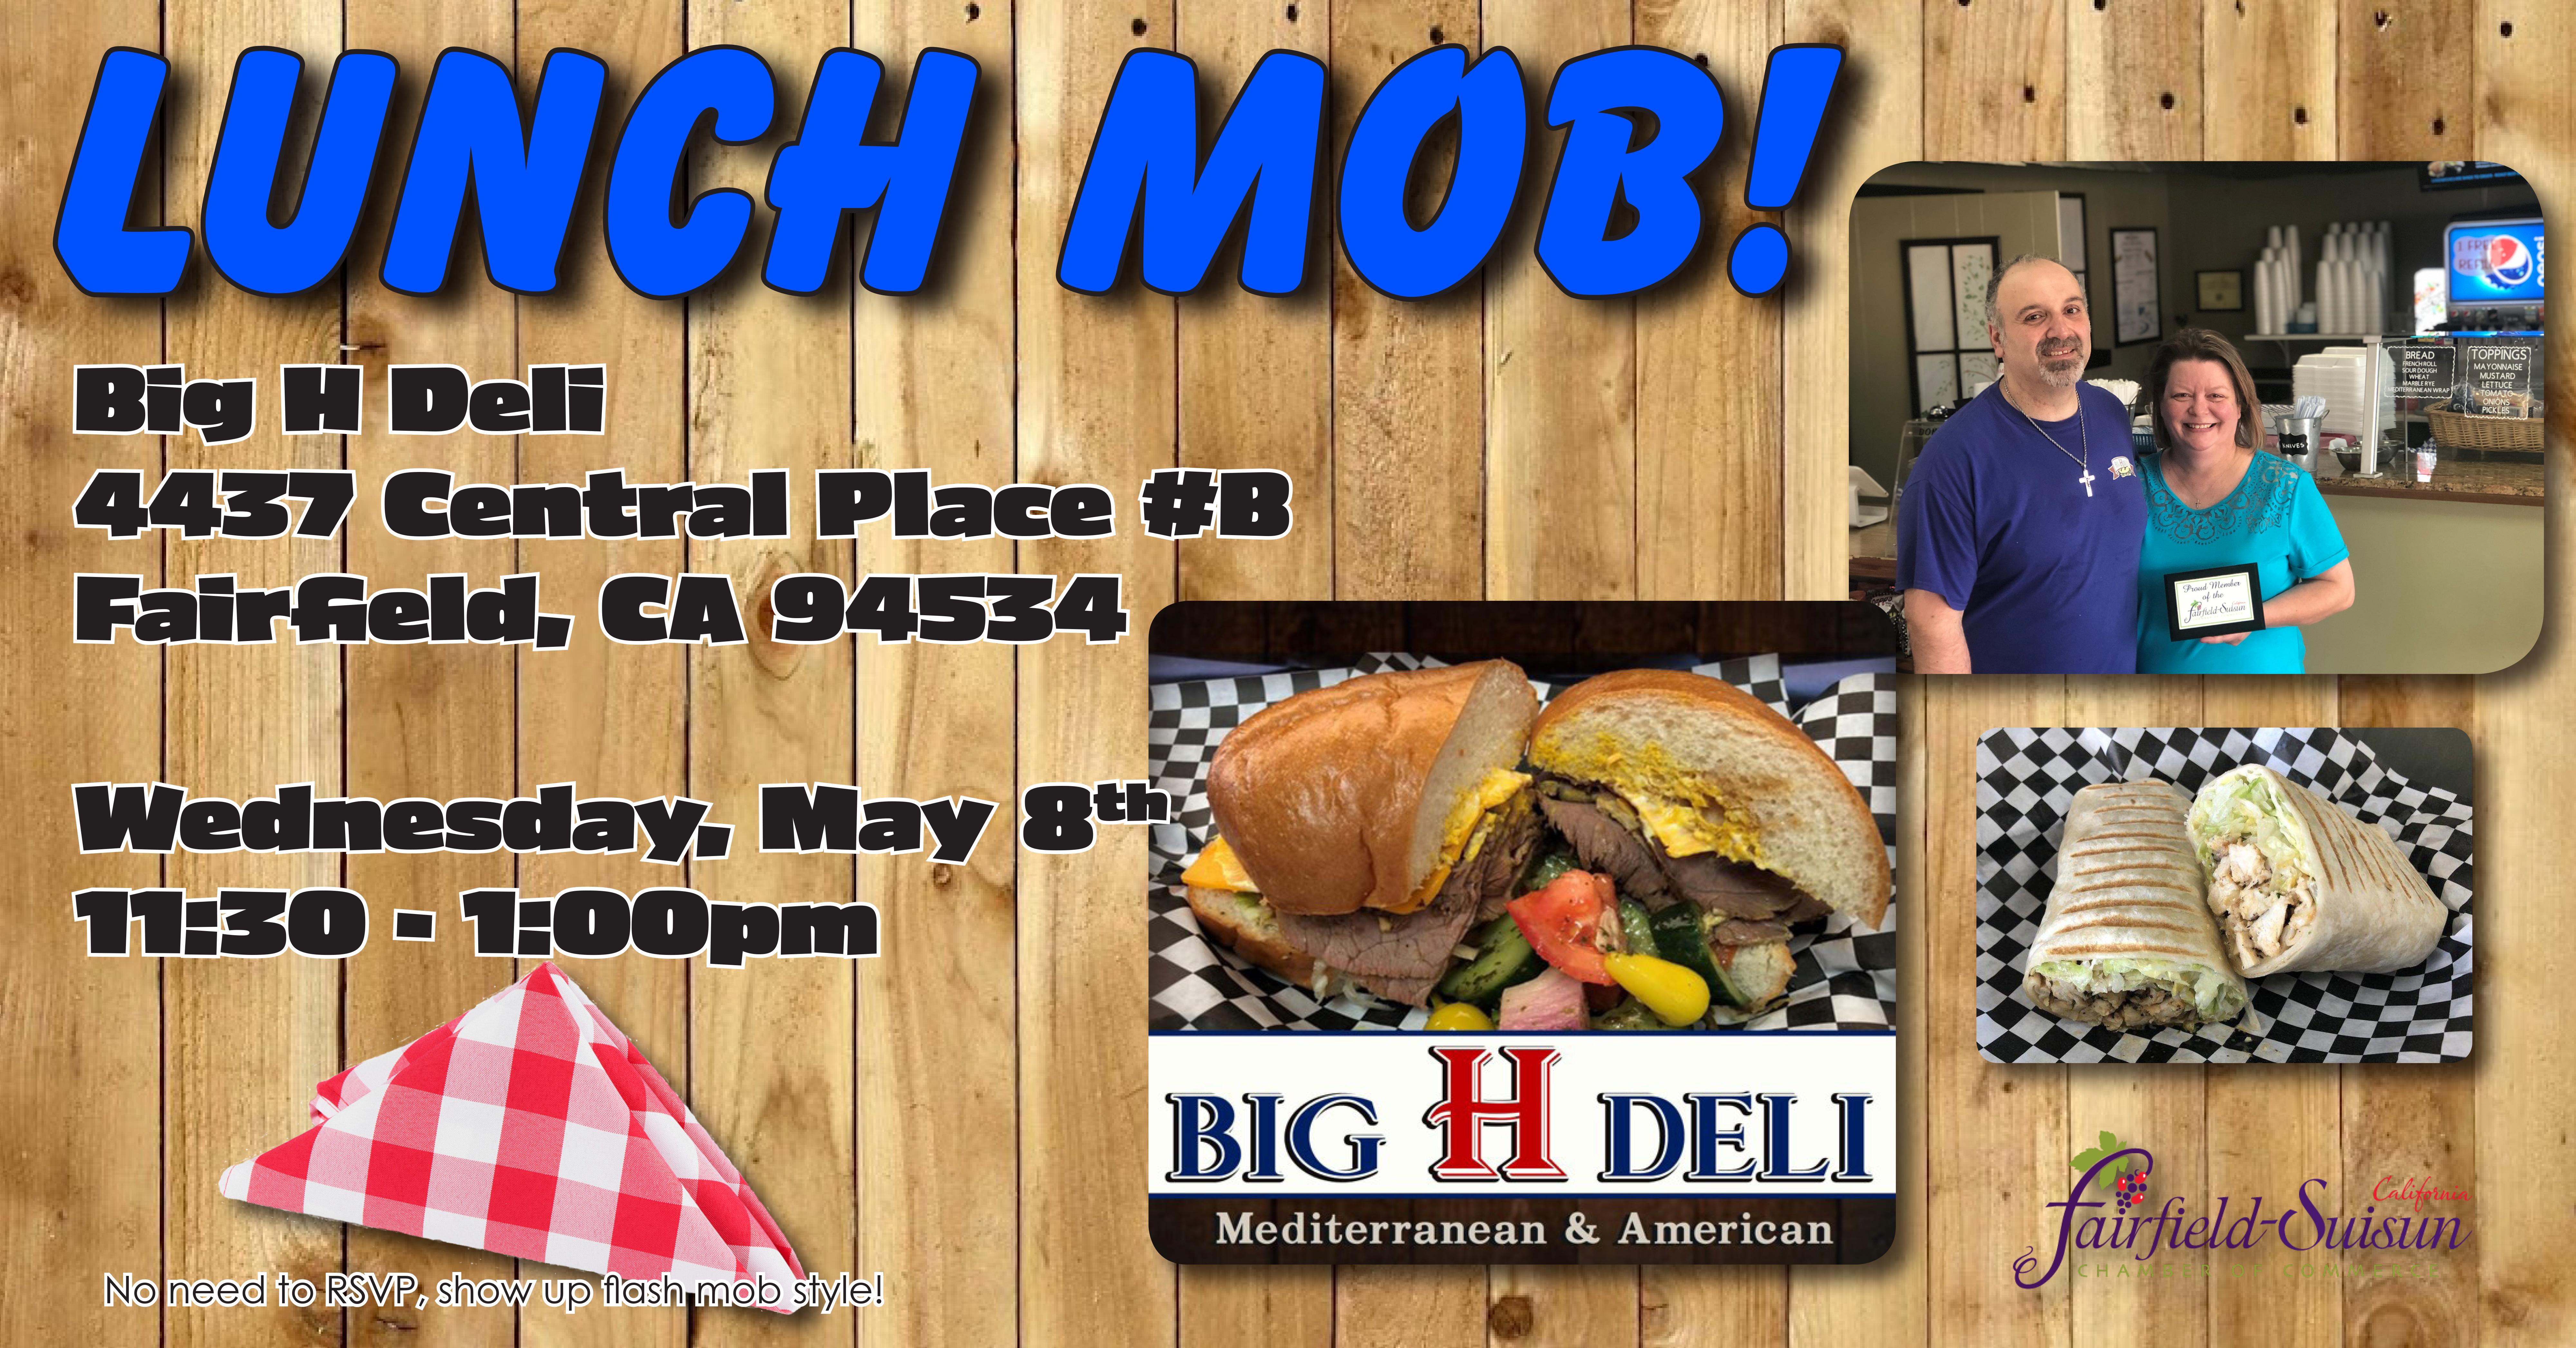 Big-H-Deli-Lunch-Mob-May-2019